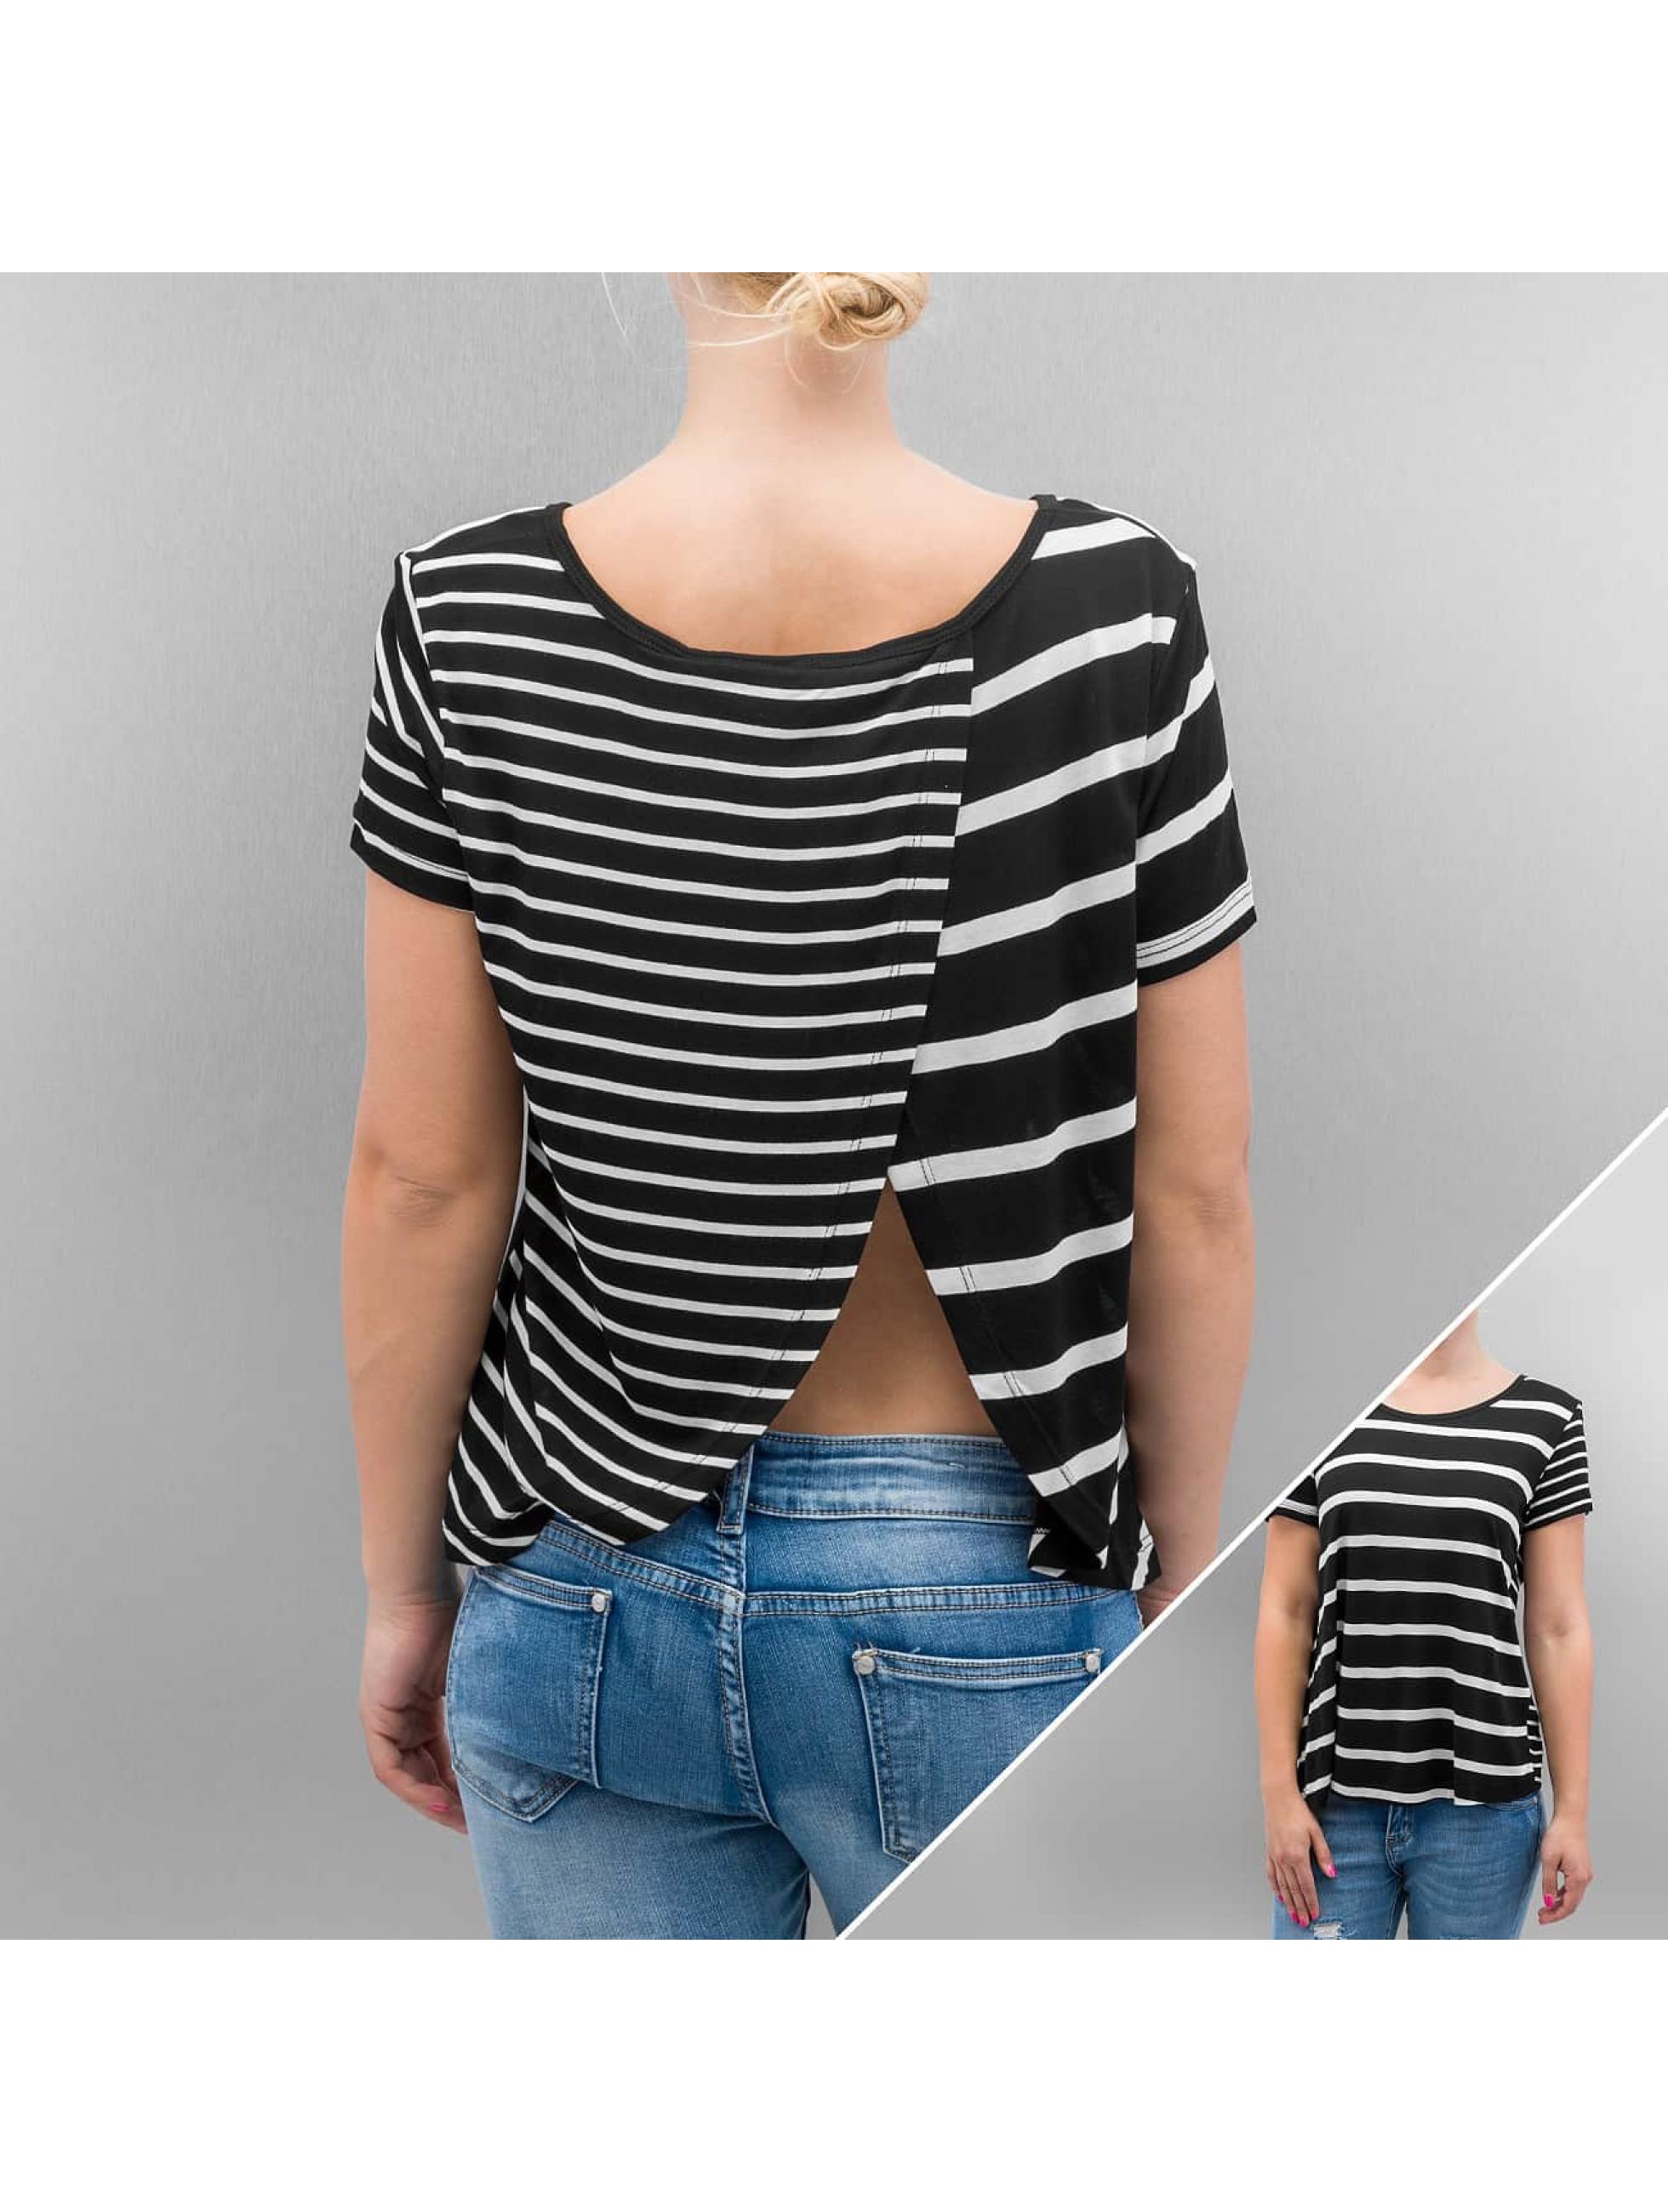 T-Shirt pcBrinny in schwarz